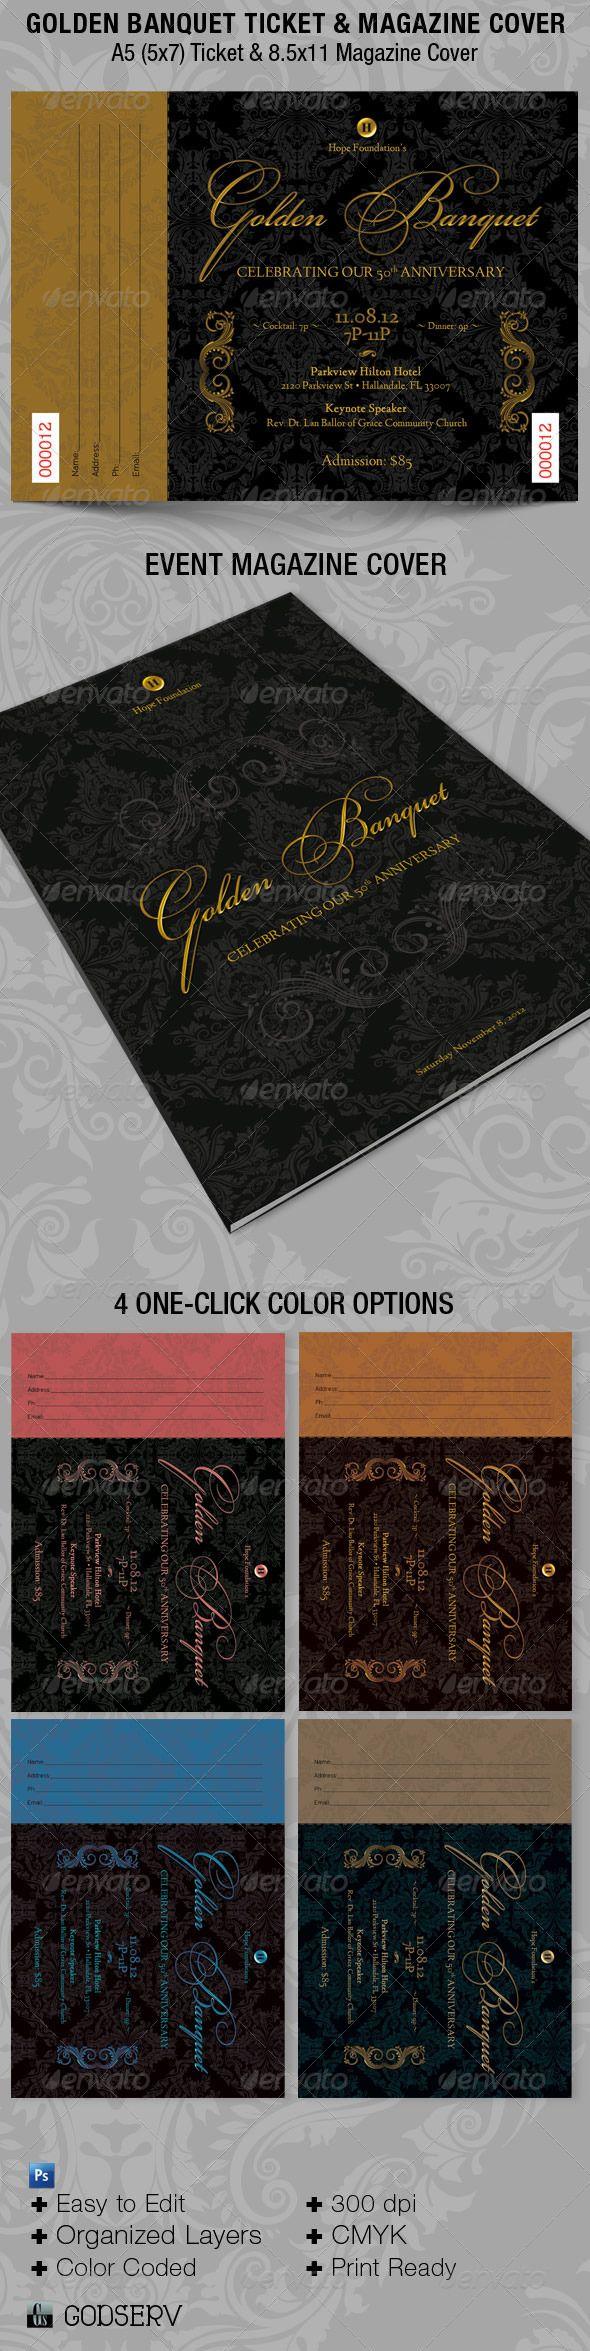 Golden Banquet Ticket Plus Magazine Cover Template - Miscellaneous Print Templates